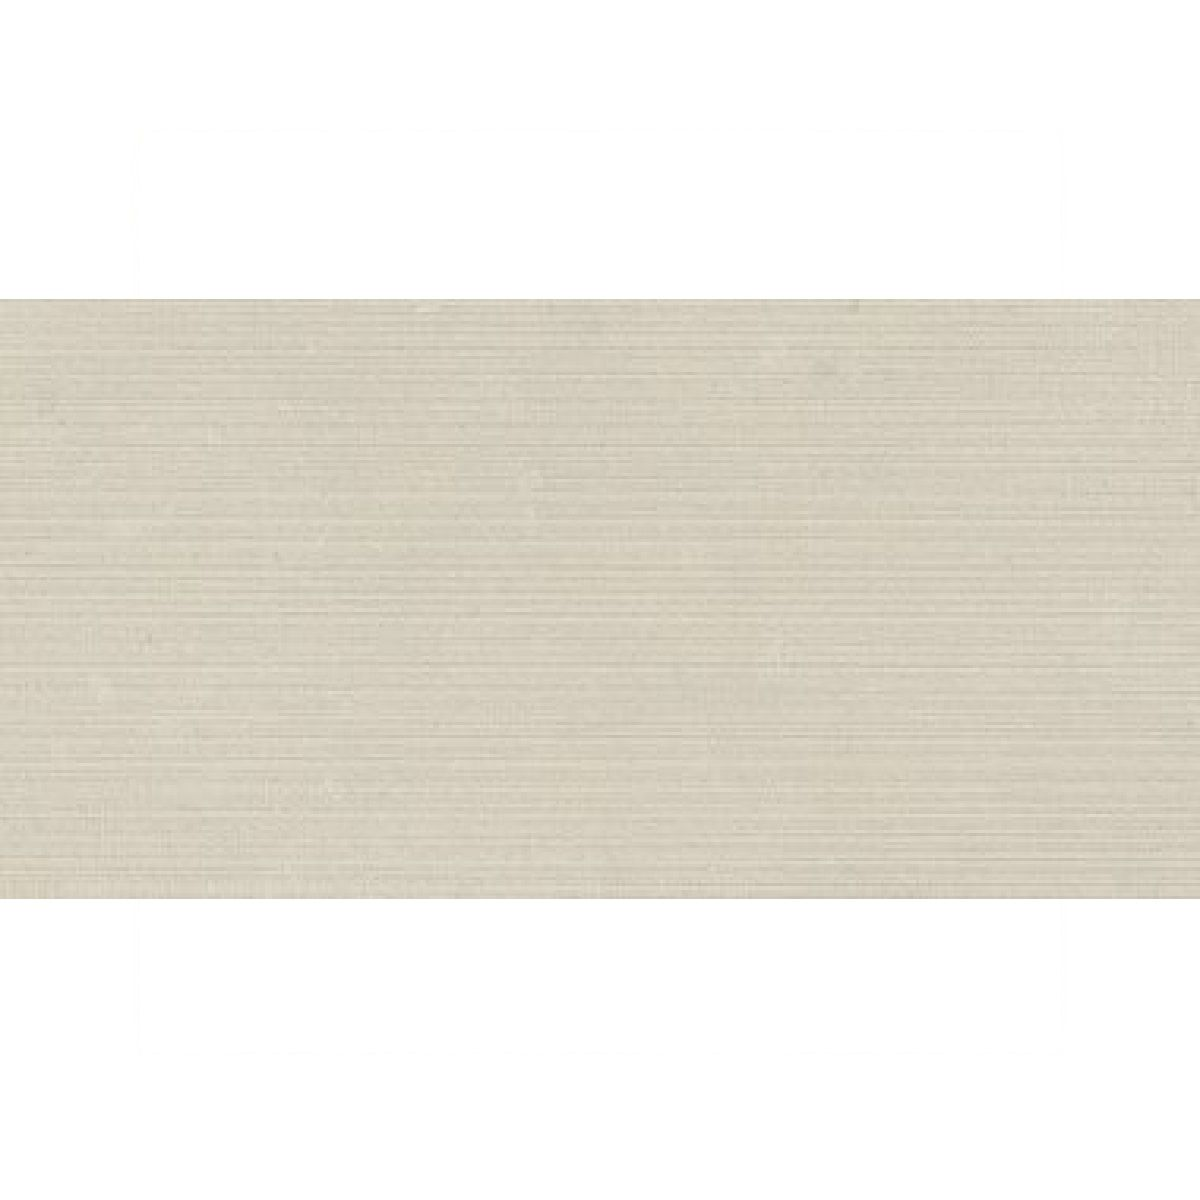 RAK Surface Off White Rustic Tile 300 x 600mm